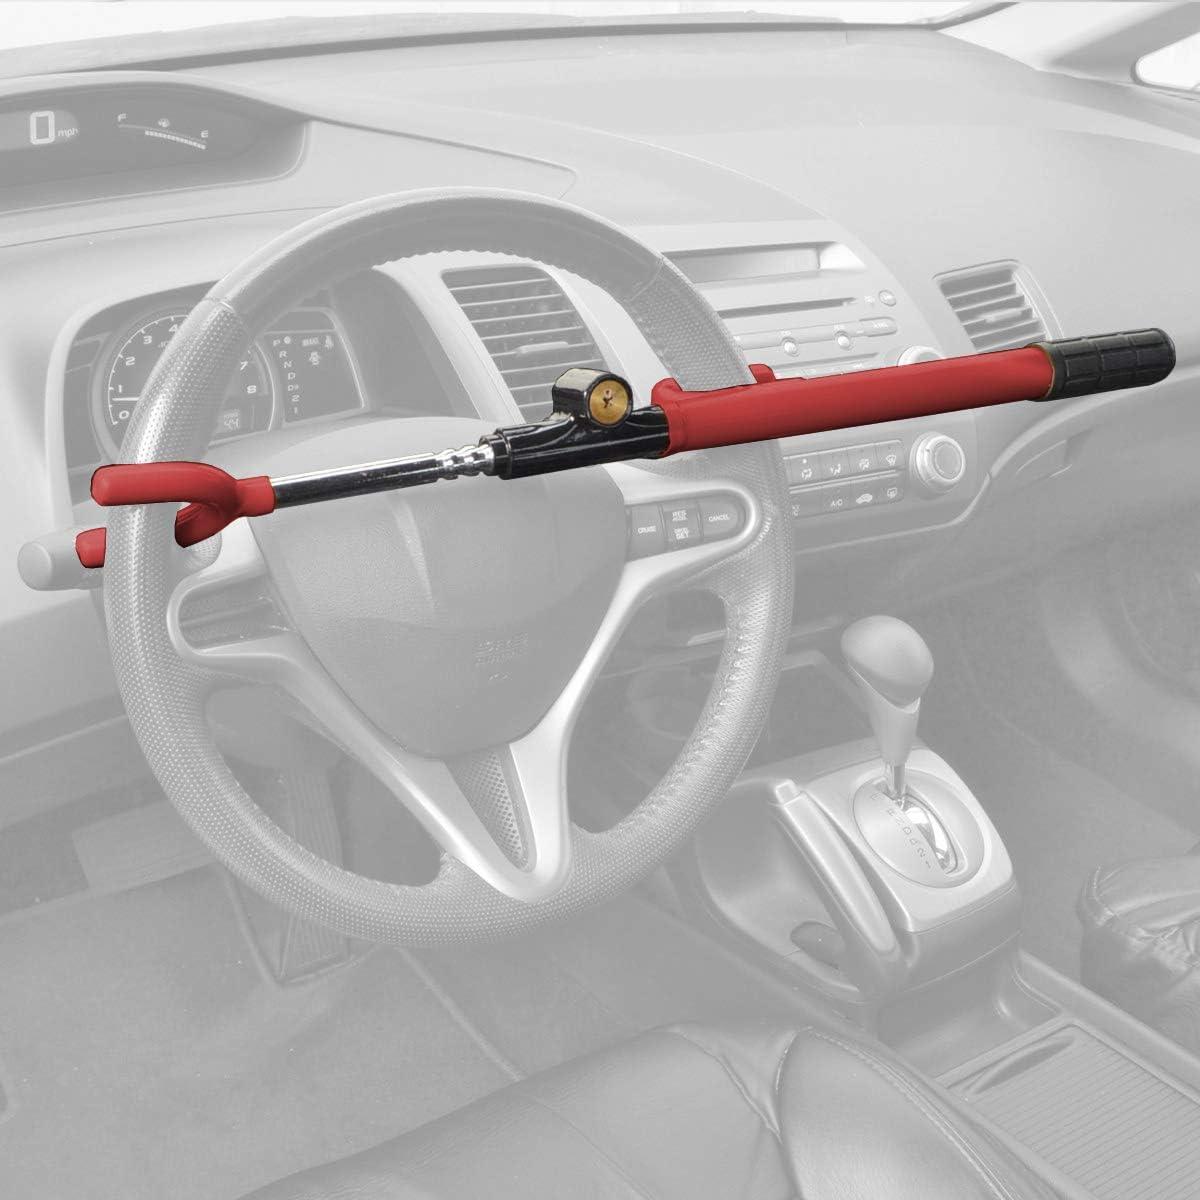 BDK Universal Steering Wheel Lock – Adjustable Heavy Duty Anti-Theft Locking Device Extra Secure Includes 2 Keys - for Car Truck Van SUV– Red